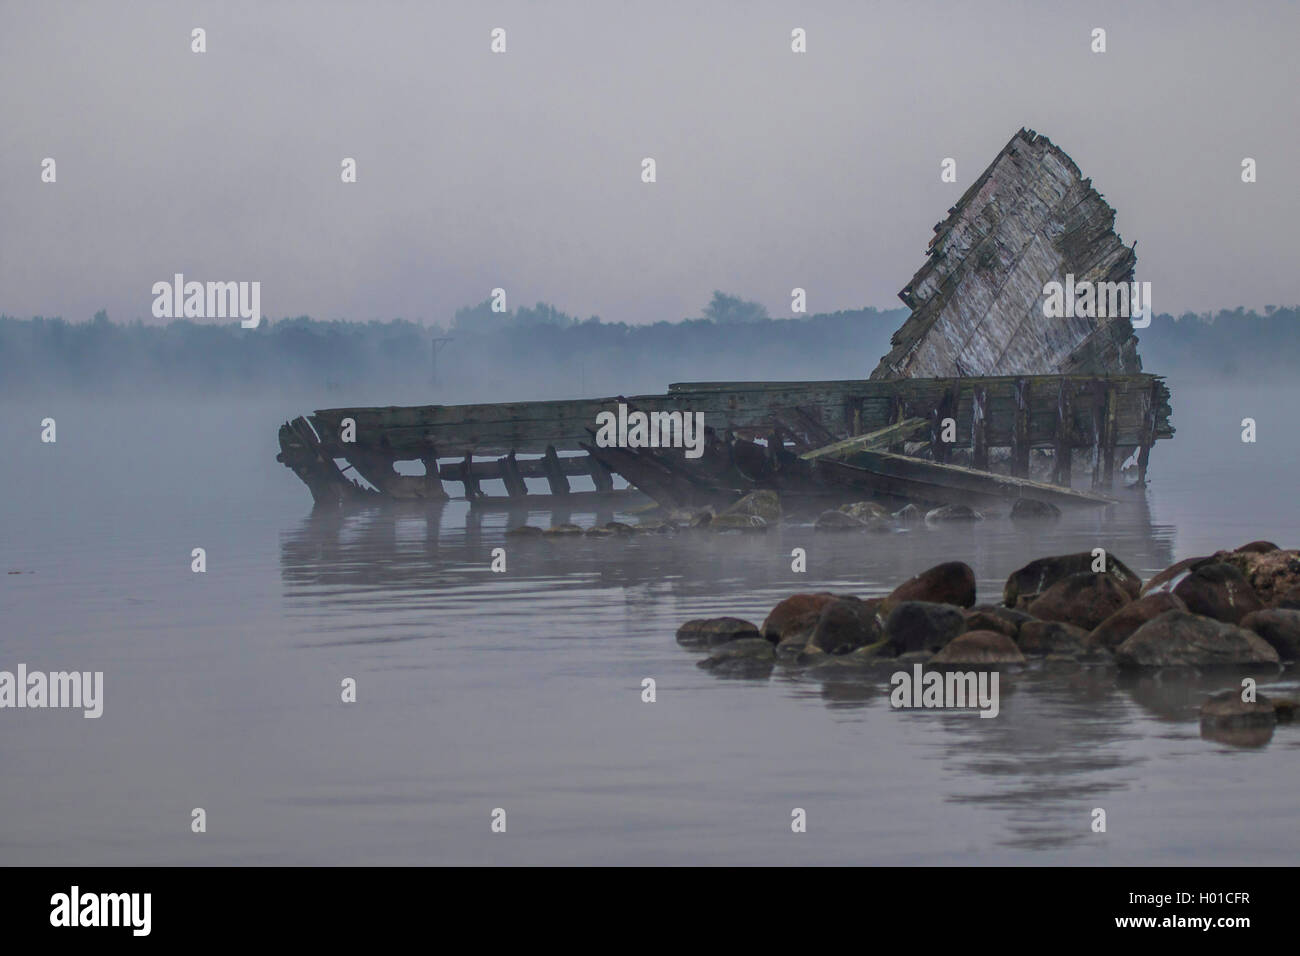 shipwreck in Breitling, Germany, Mecklenburg-Western Pomerania, Schnatermann, Rostock Stock Photo